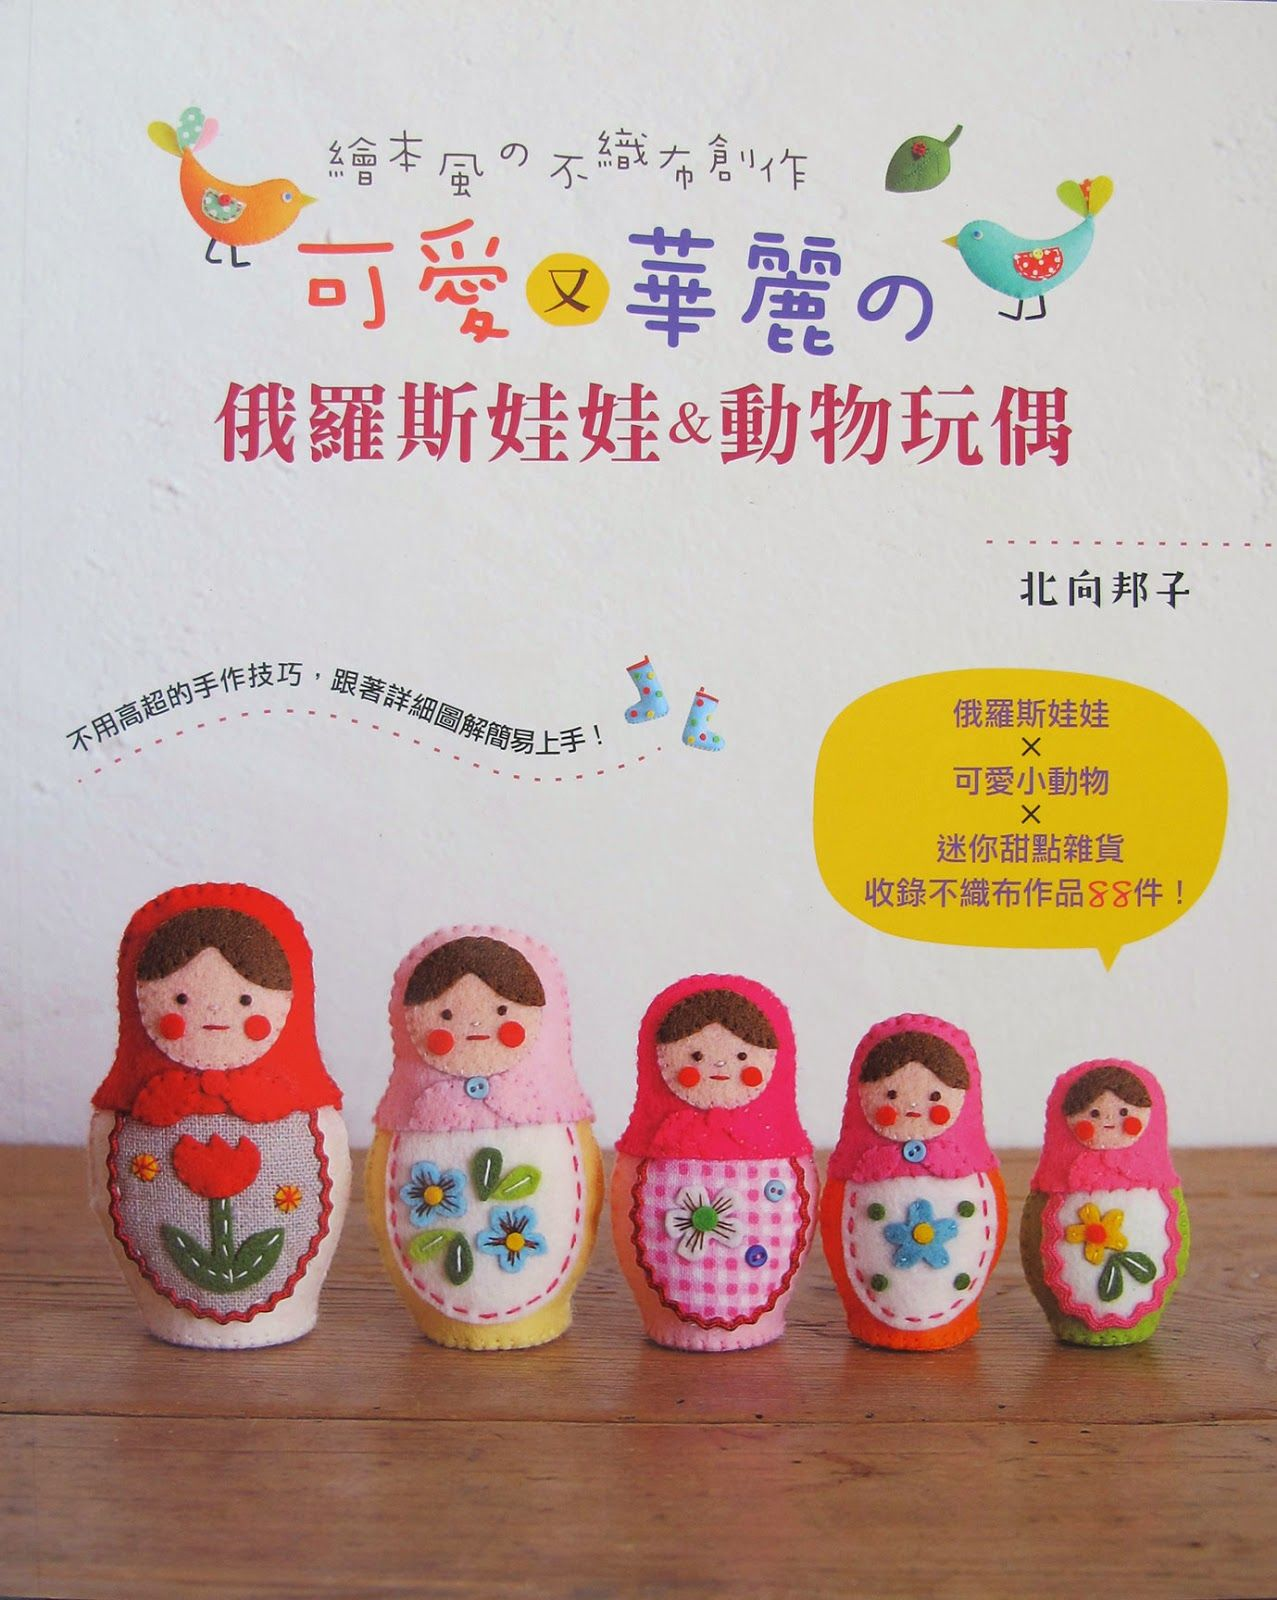 Felt craft book - Japanese Felt Craft Book Variety Of Felt Russian Doll Patterns